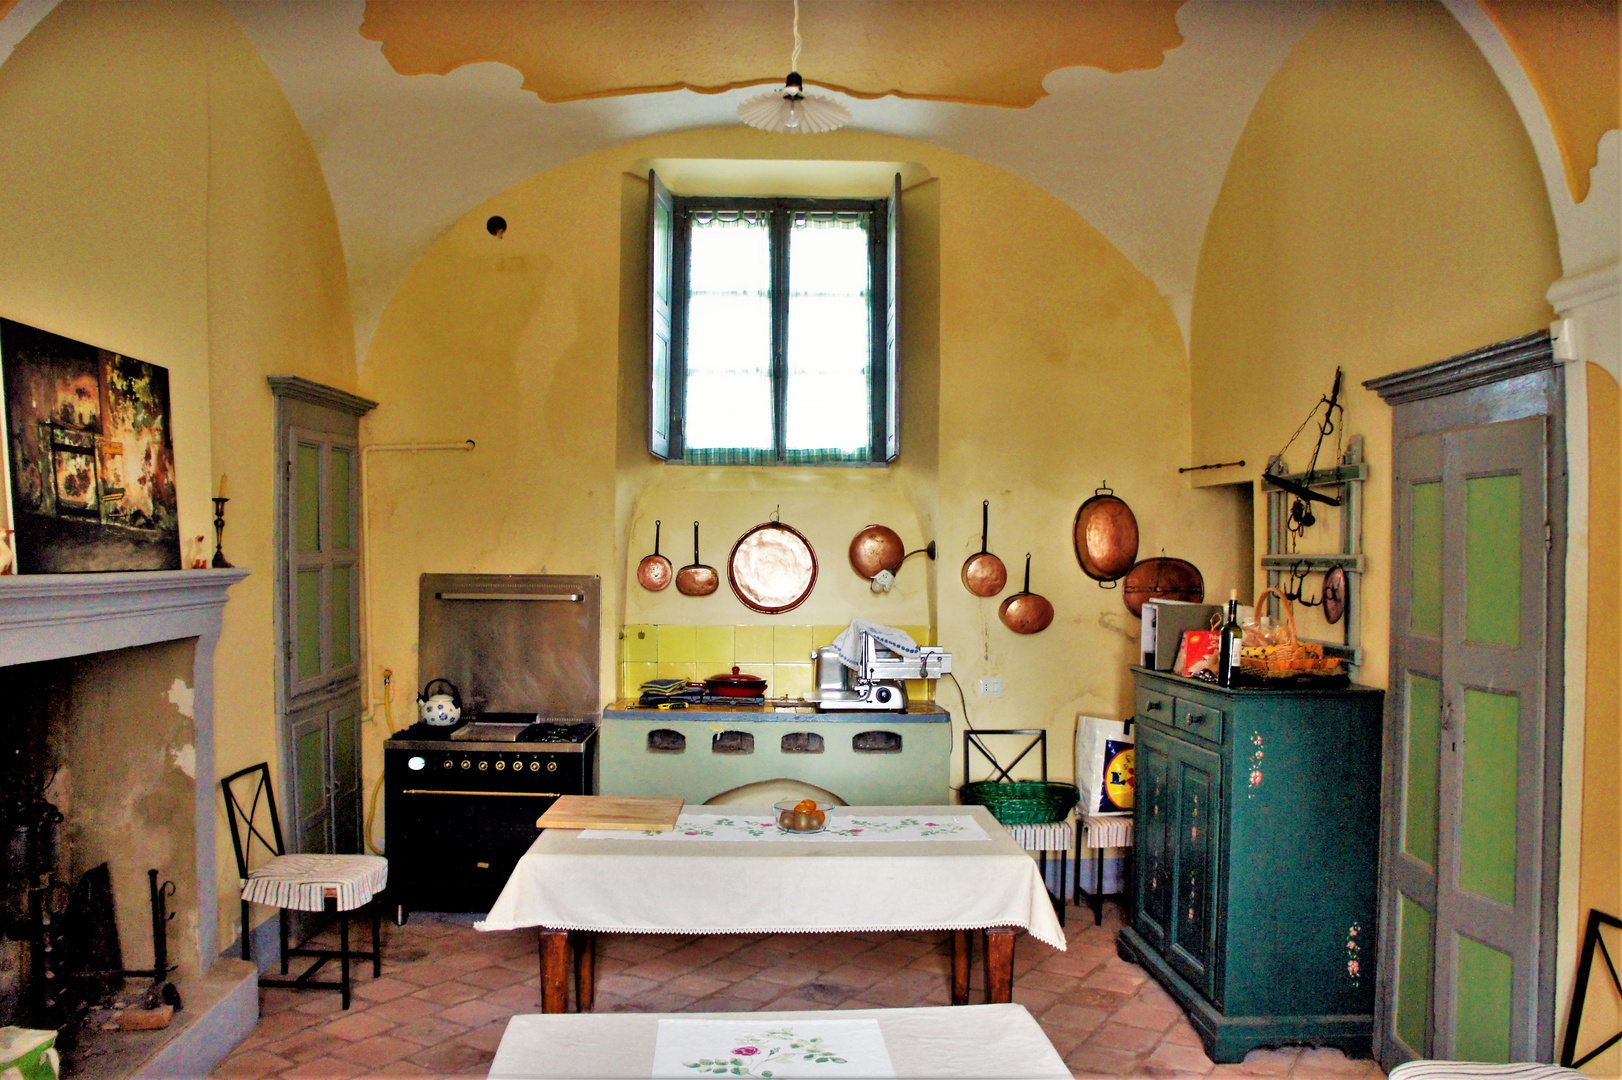 Cucina di campagna Foto & Bild | italy, dokumentation, italien ...